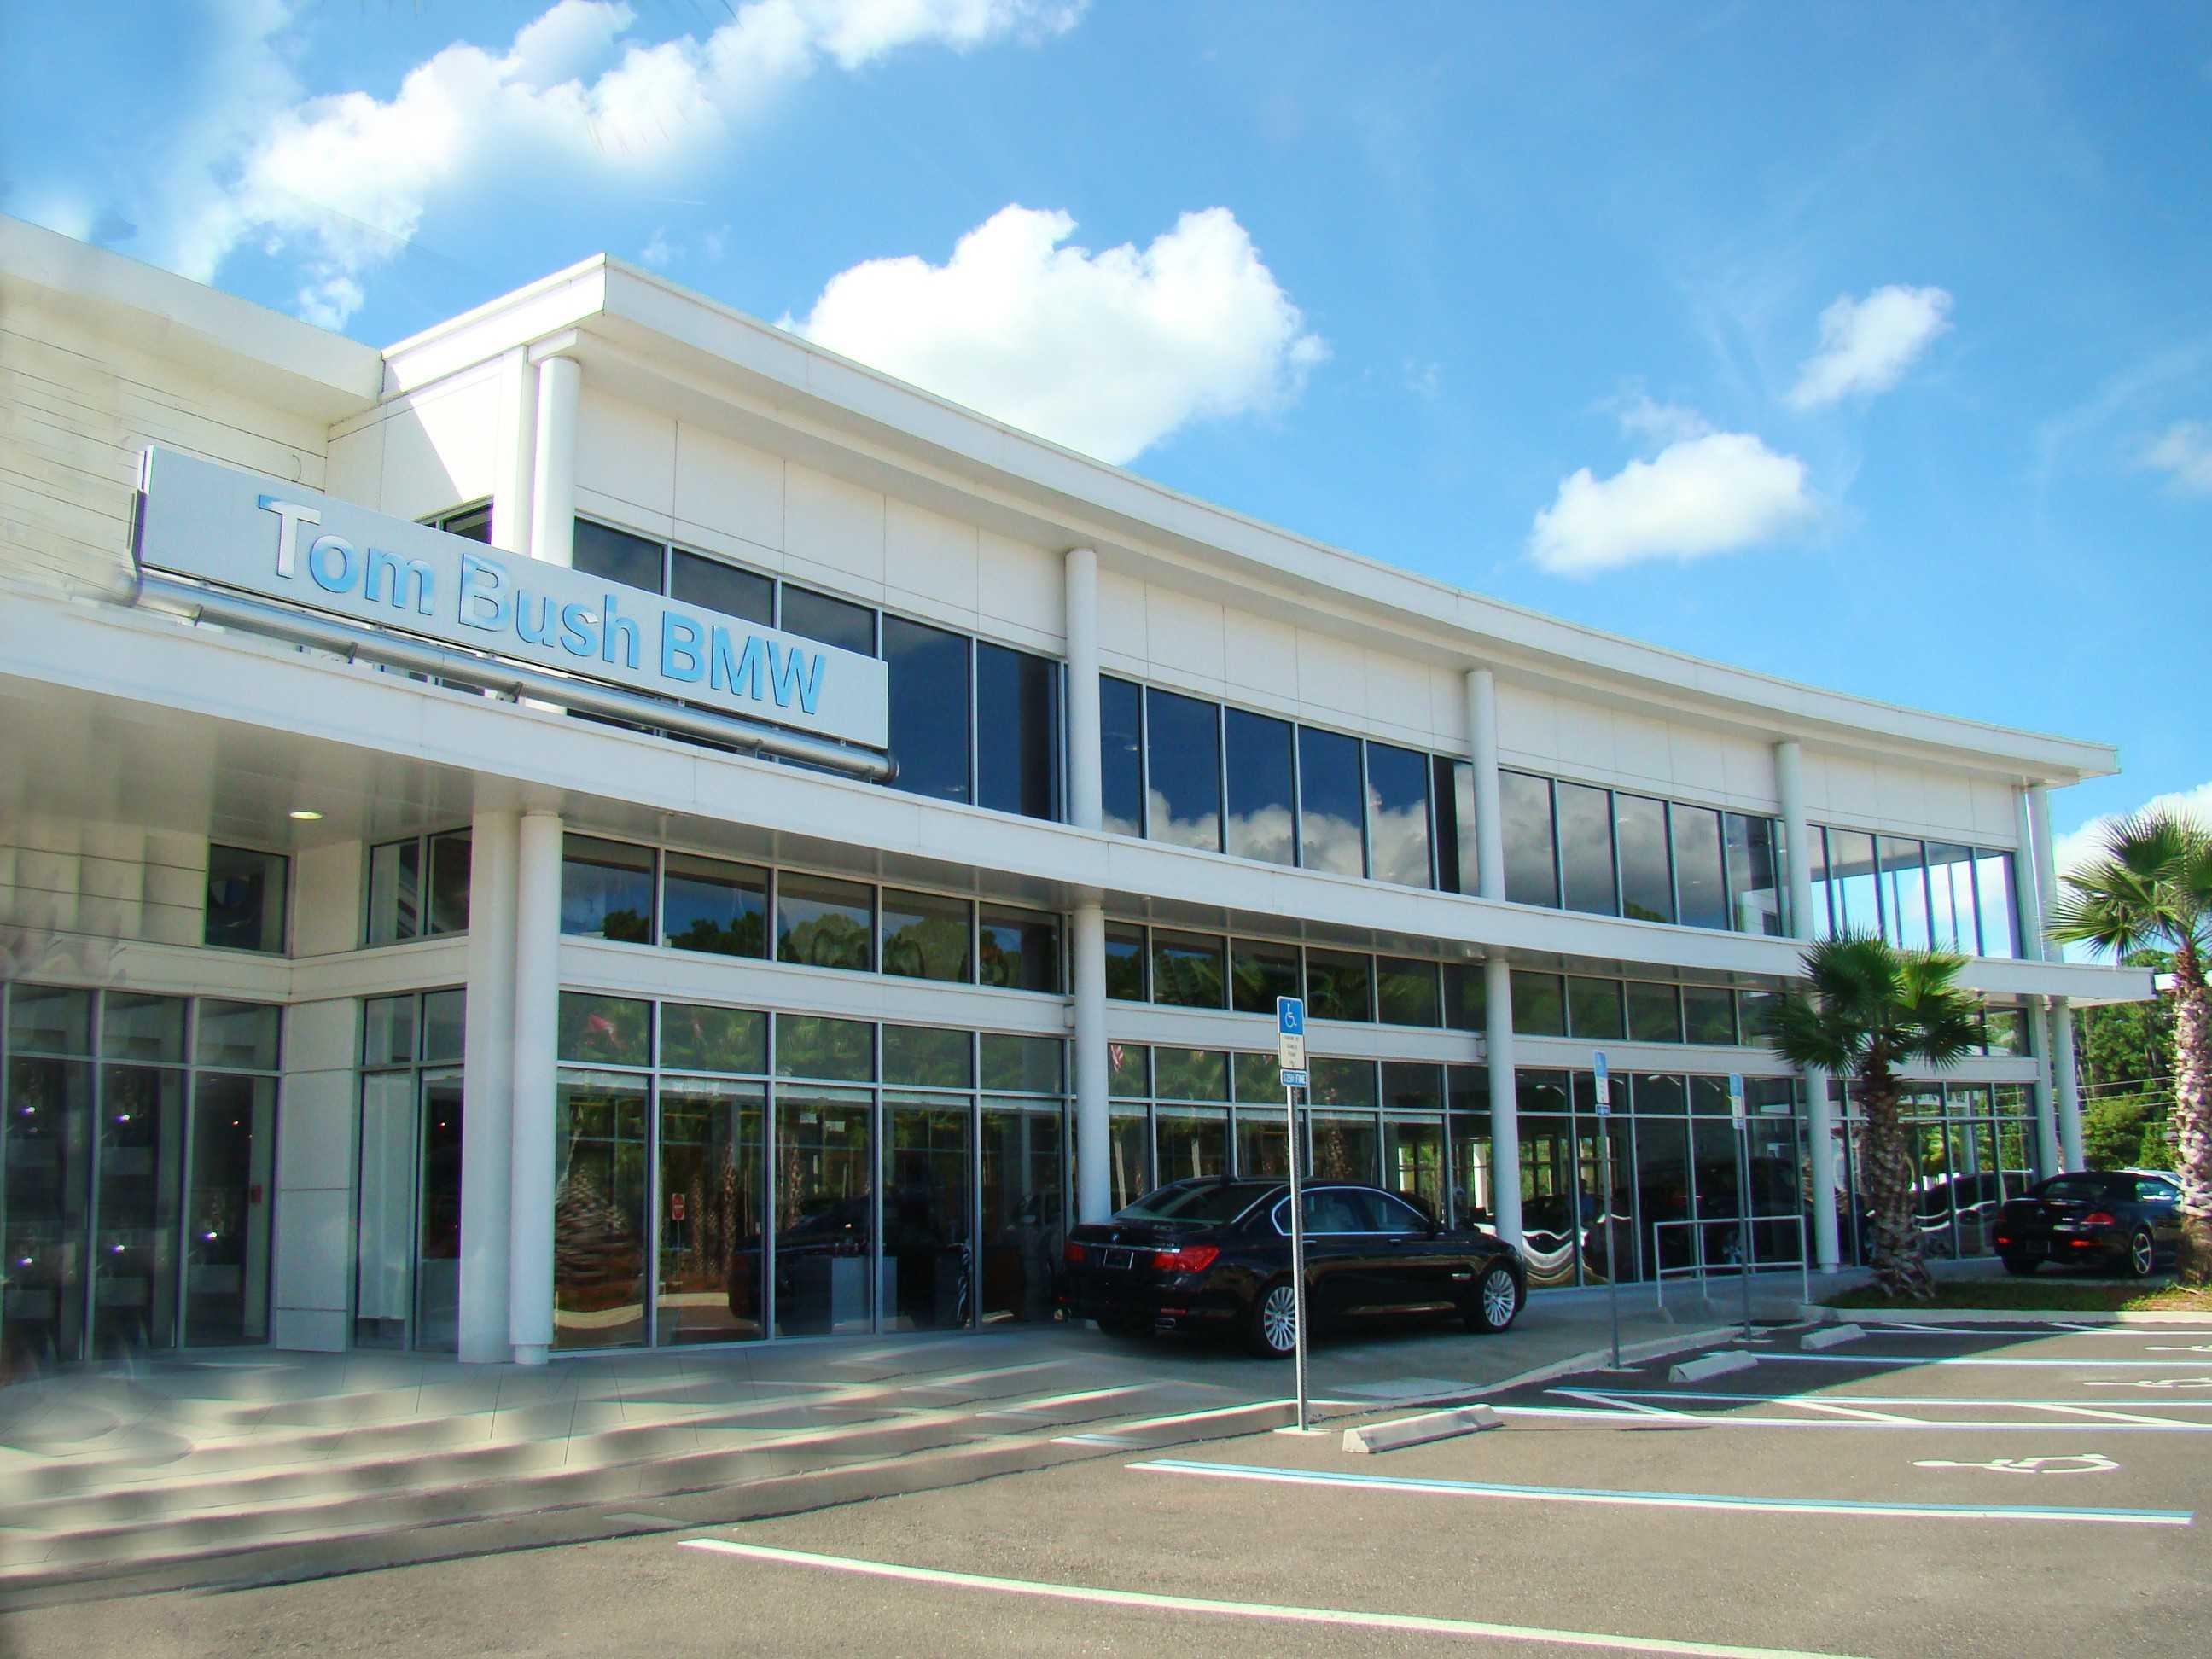 Tom Bush BMW of Orange Park opens on Blanding Blvd. Go to our Tom Bush BMW Orange Park website